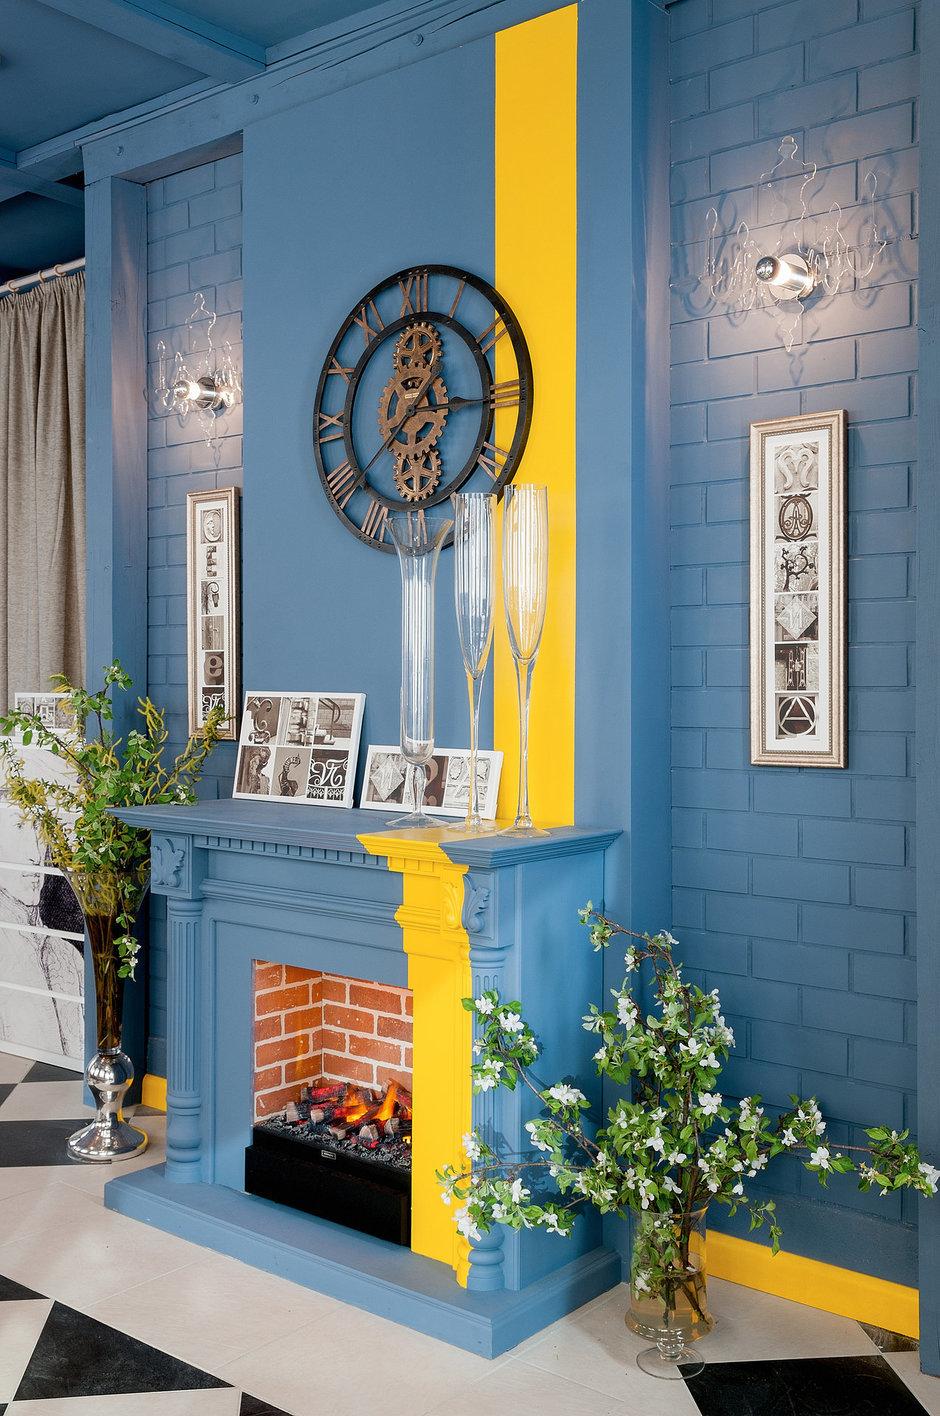 Фотография: Декор в стиле Современный, Эклектика, Декор интерьера, Декор дома, IKEA, Ligne Roset, Kartell, Веранда – фото на InMyRoom.ru